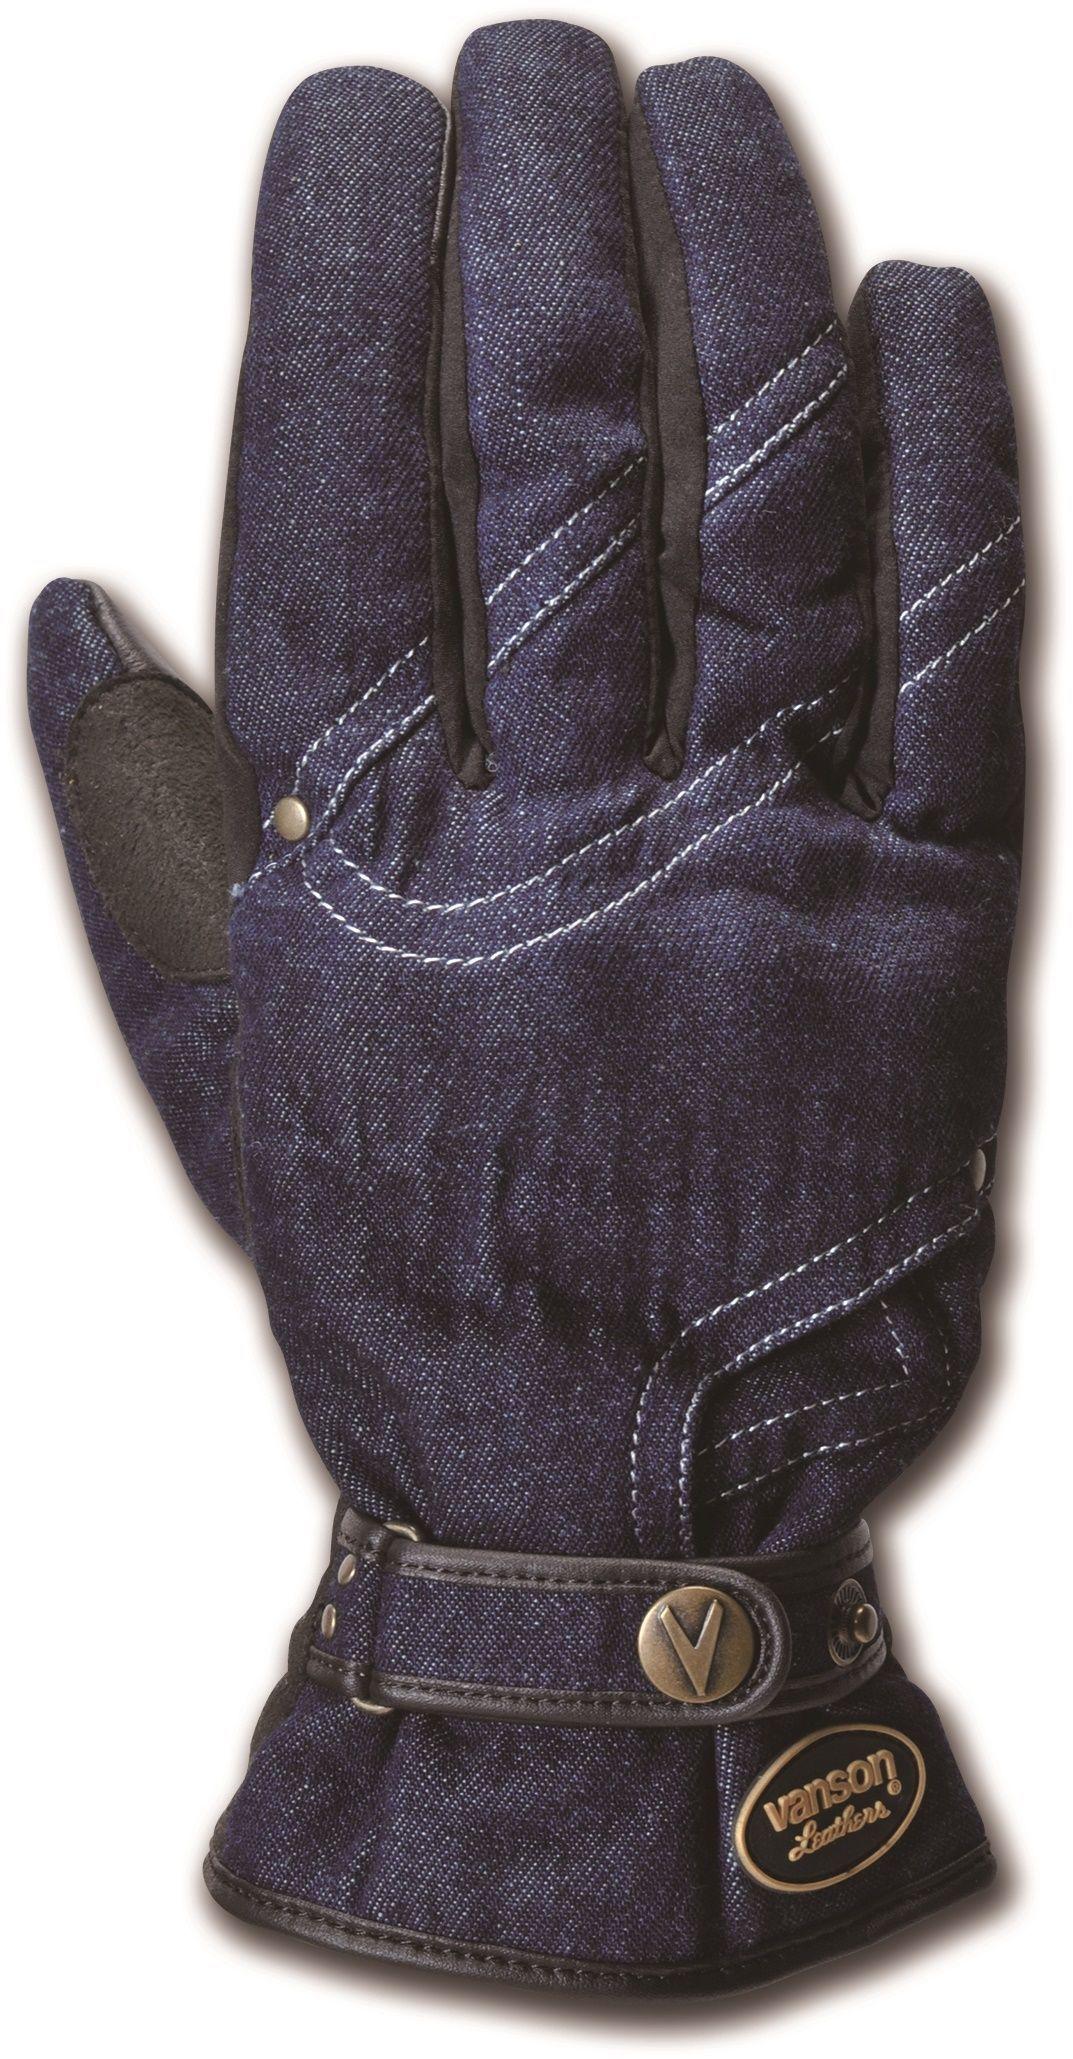 【VANSON】手腕調整帶(束帶)丹寧牛仔FW手套 - 「Webike-摩托百貨」